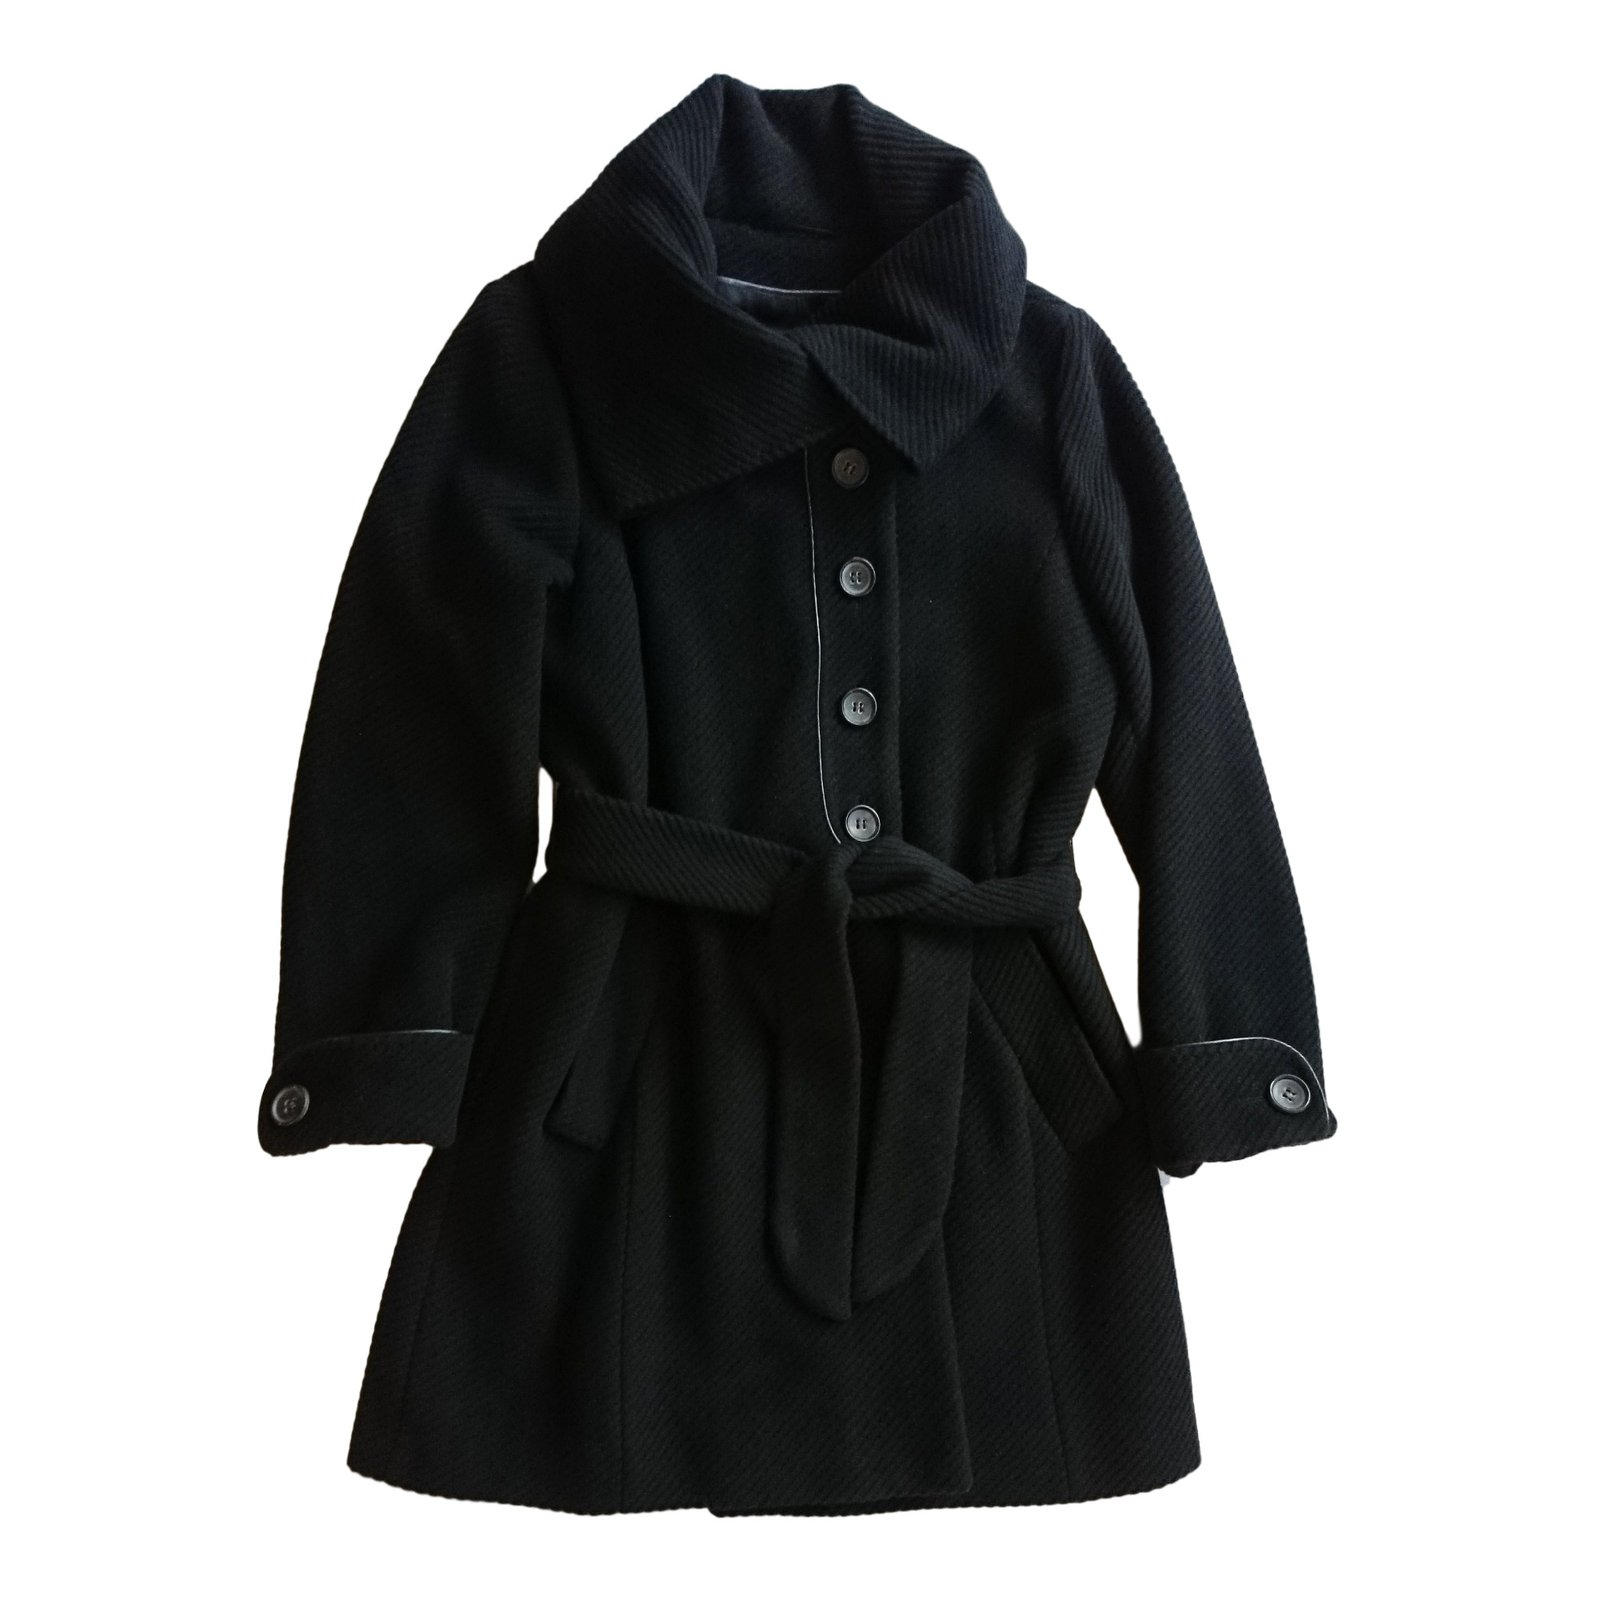 manteaux gerard darel manteau laine noir joli closet. Black Bedroom Furniture Sets. Home Design Ideas